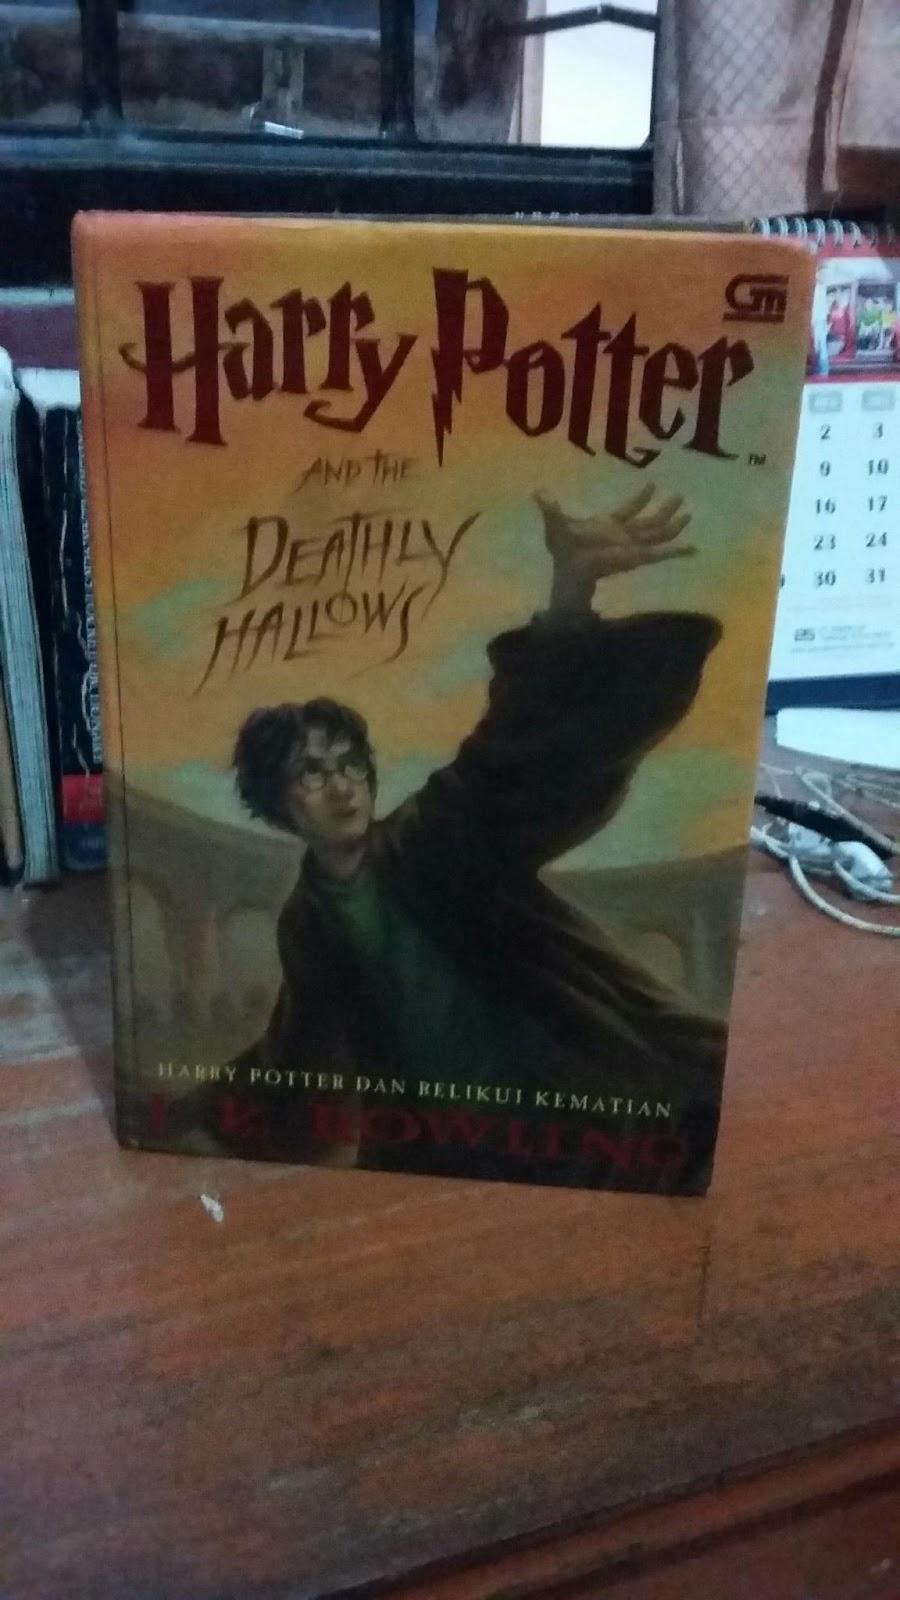 Berkenalan Dengan Harry Potter Di Seri Ketujuh Soft Cover And The Deathly Hallows Dan Relikui Kematian Jk Rowling 20 Desember 2016